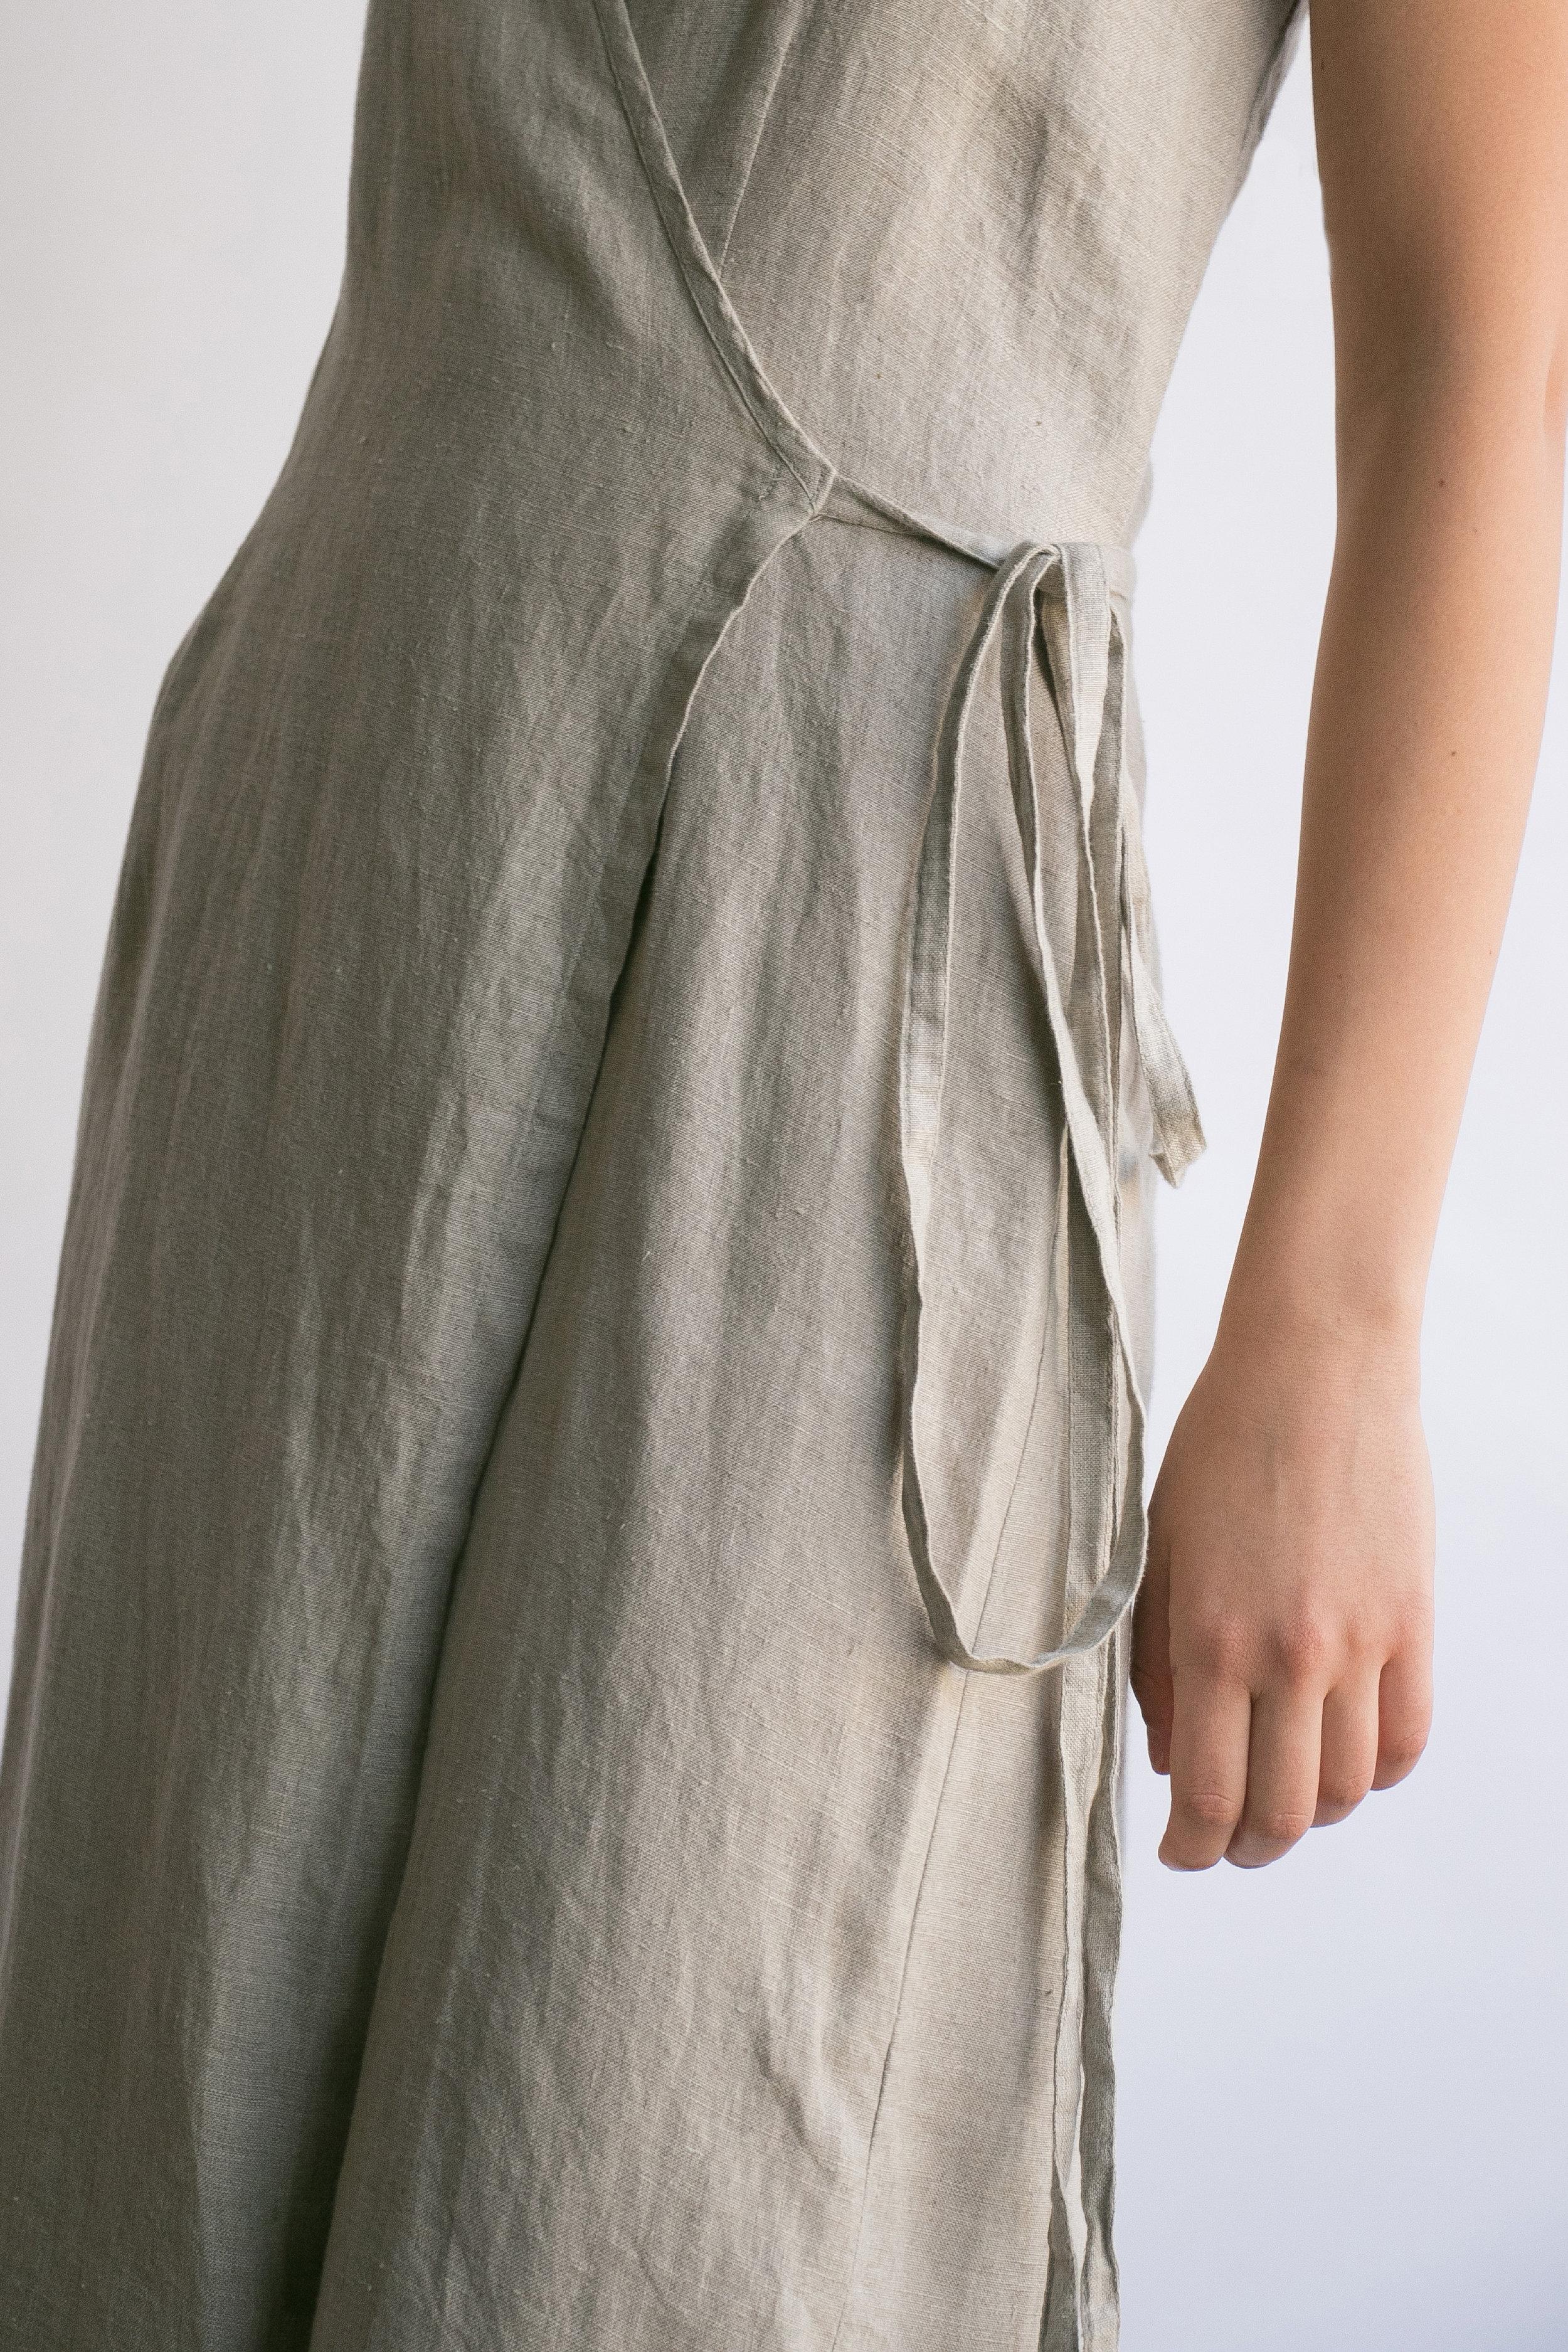 A Part of the Rest - Circa Now- Salt and Sand-Lauren Caruso-vintage finds-I am that shop linen wrap dress.jpg